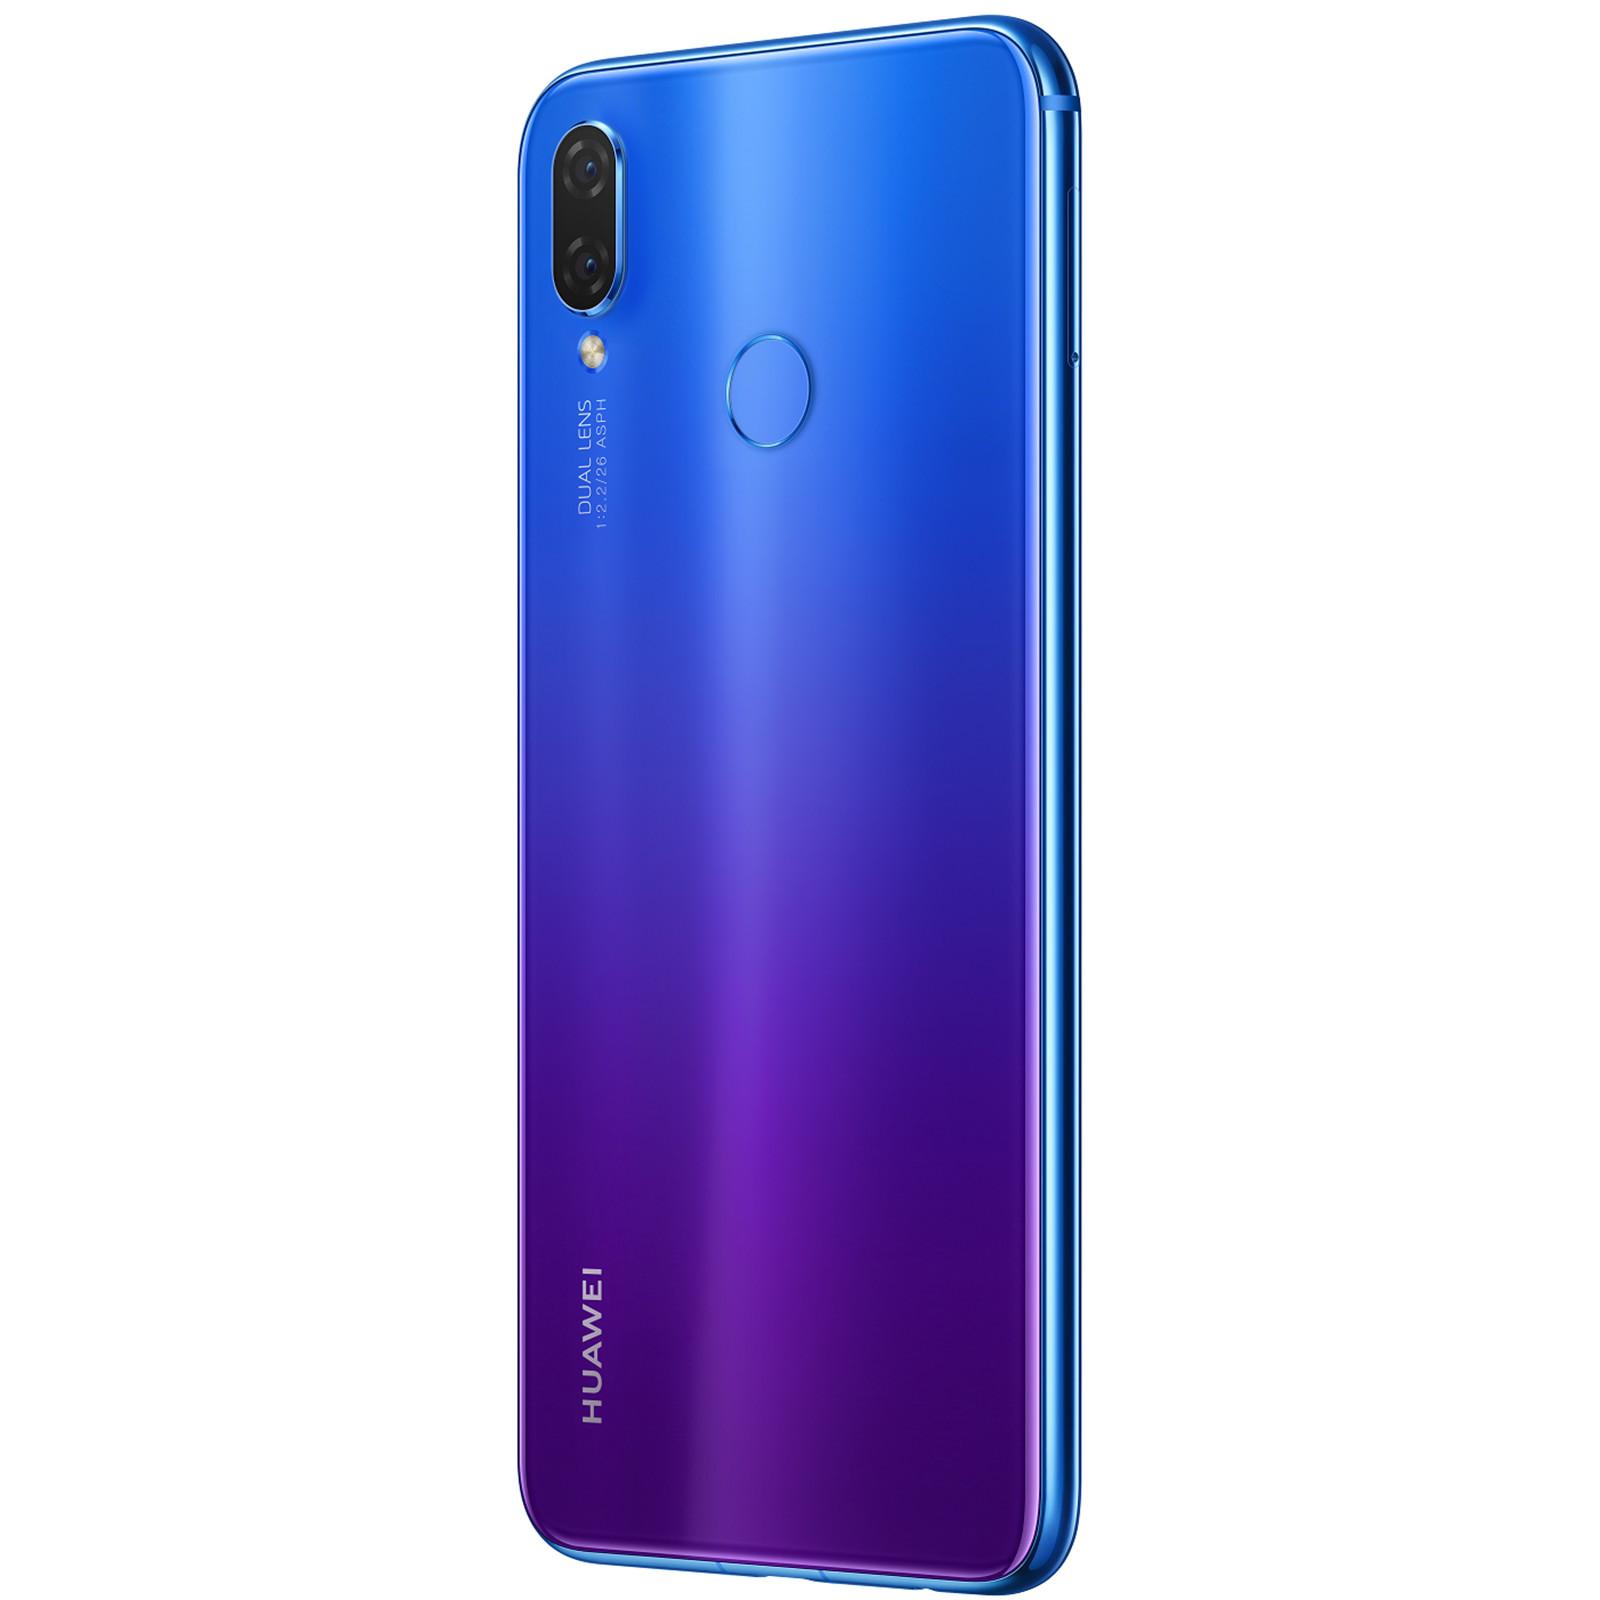 Buy the Huawei Nova 3i Smartphone - 128GB Iris Purple 2 Year Warranty (  INE-LX2 Iris Purple 2D ) online